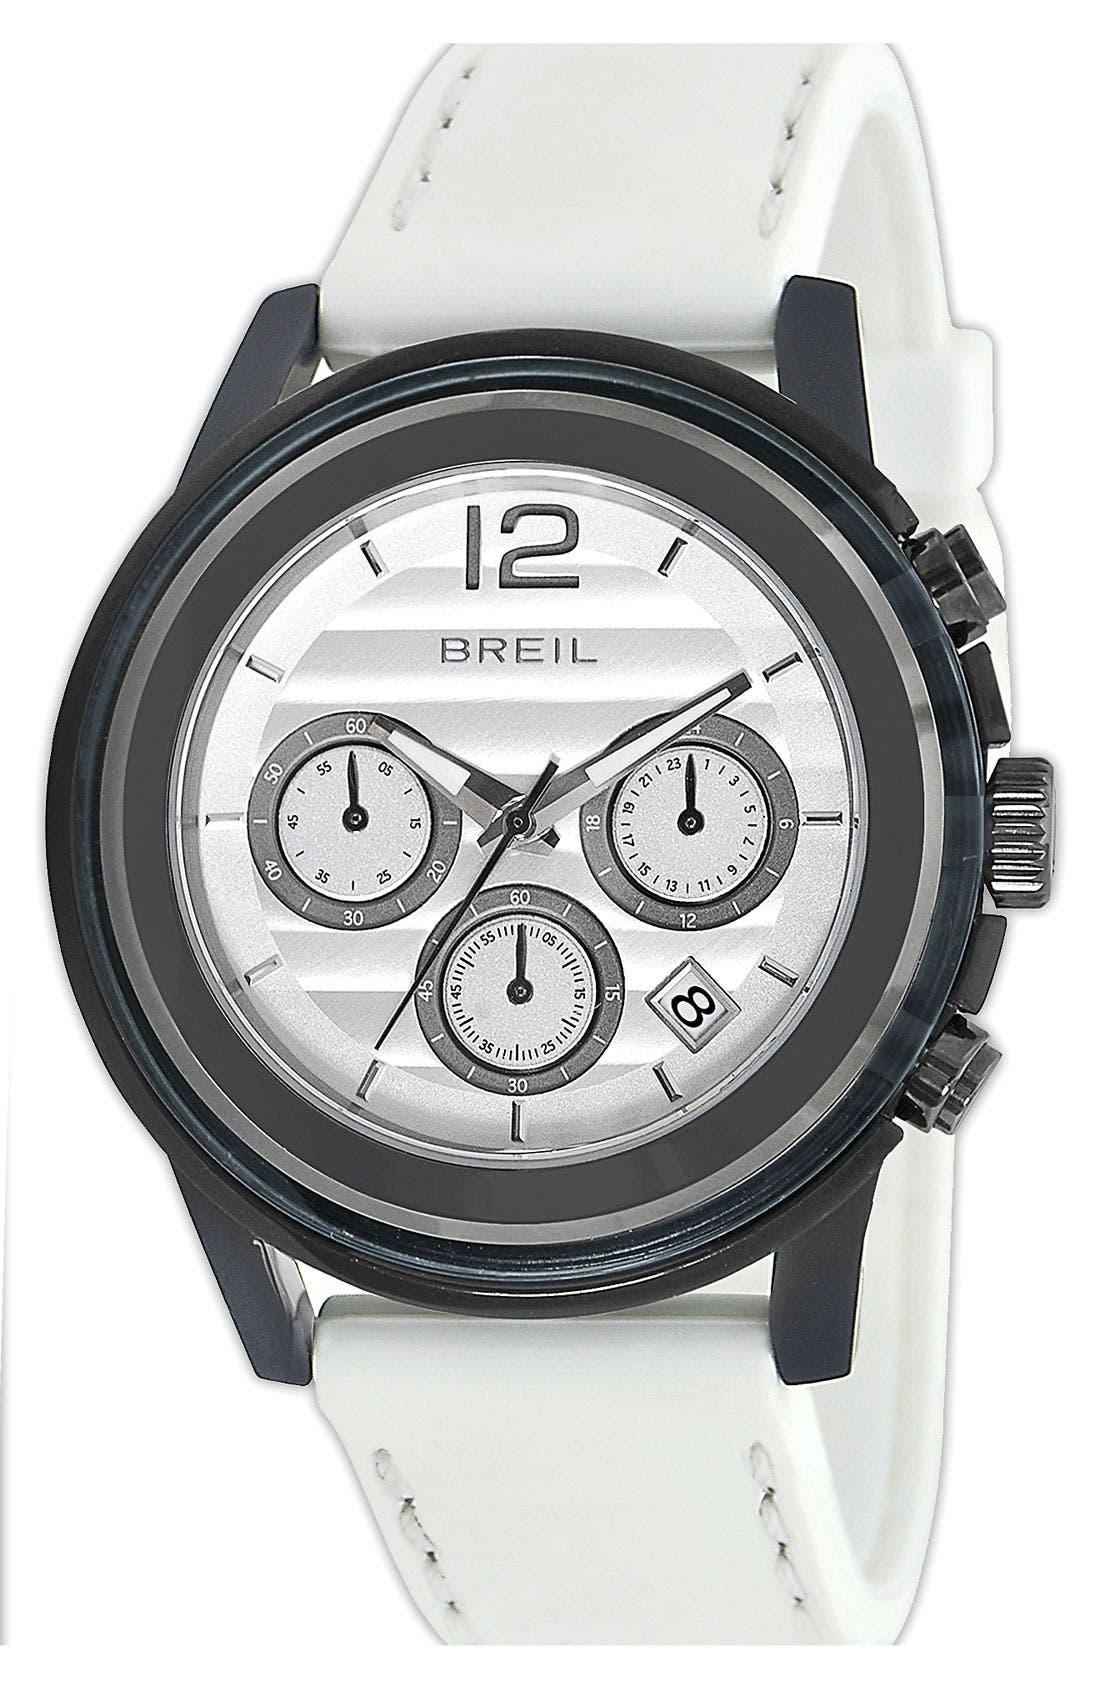 Main Image - Breil 'Orchestra' Chronograph Watch